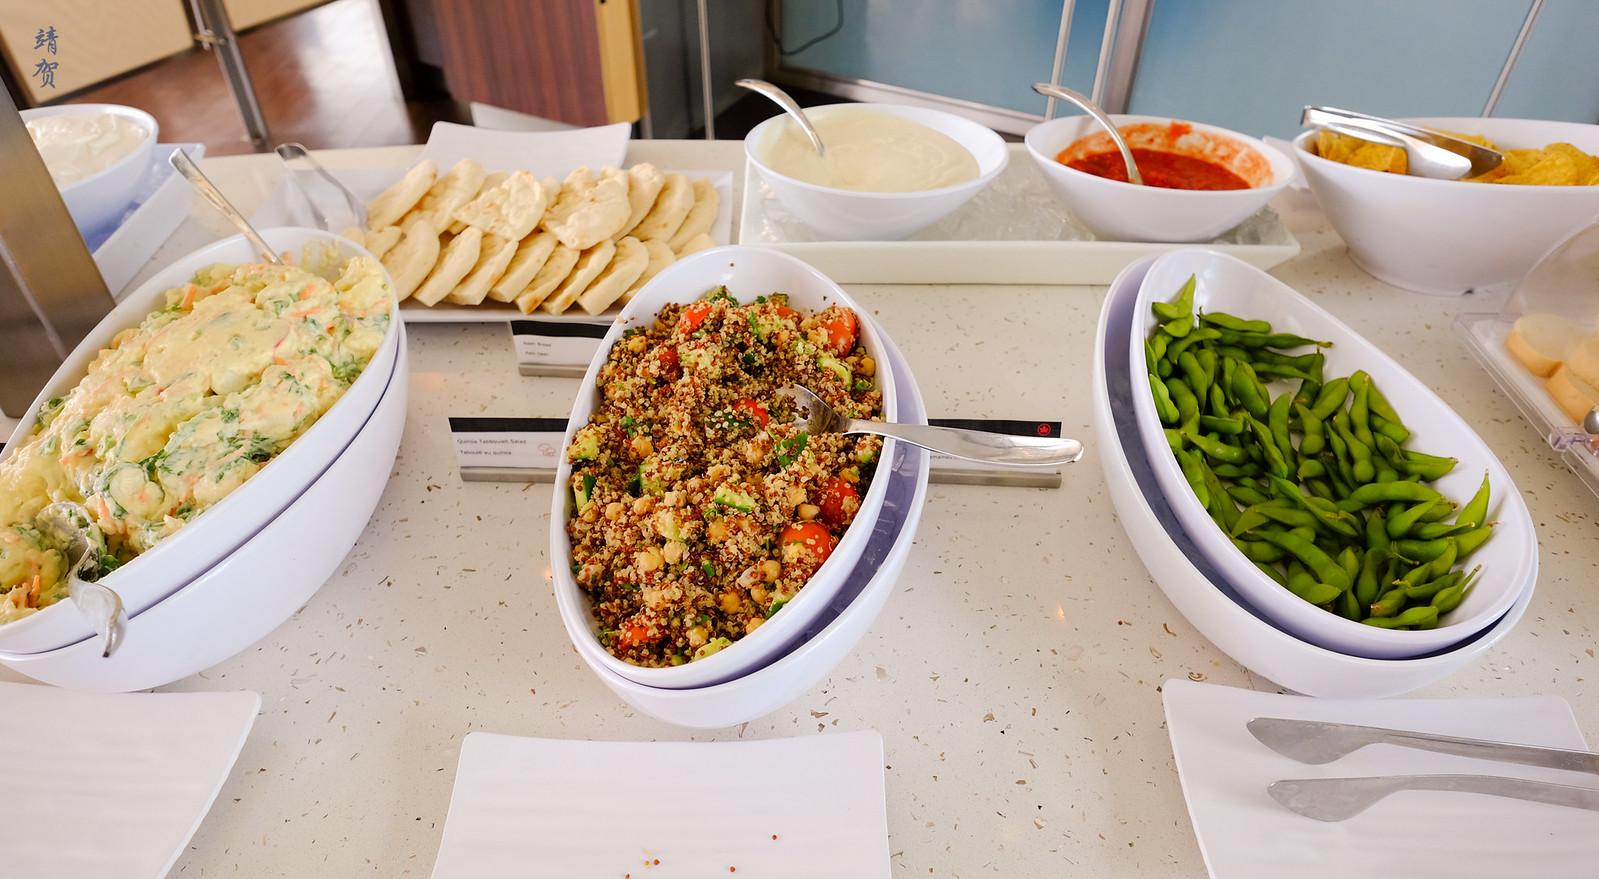 Salad and edamame